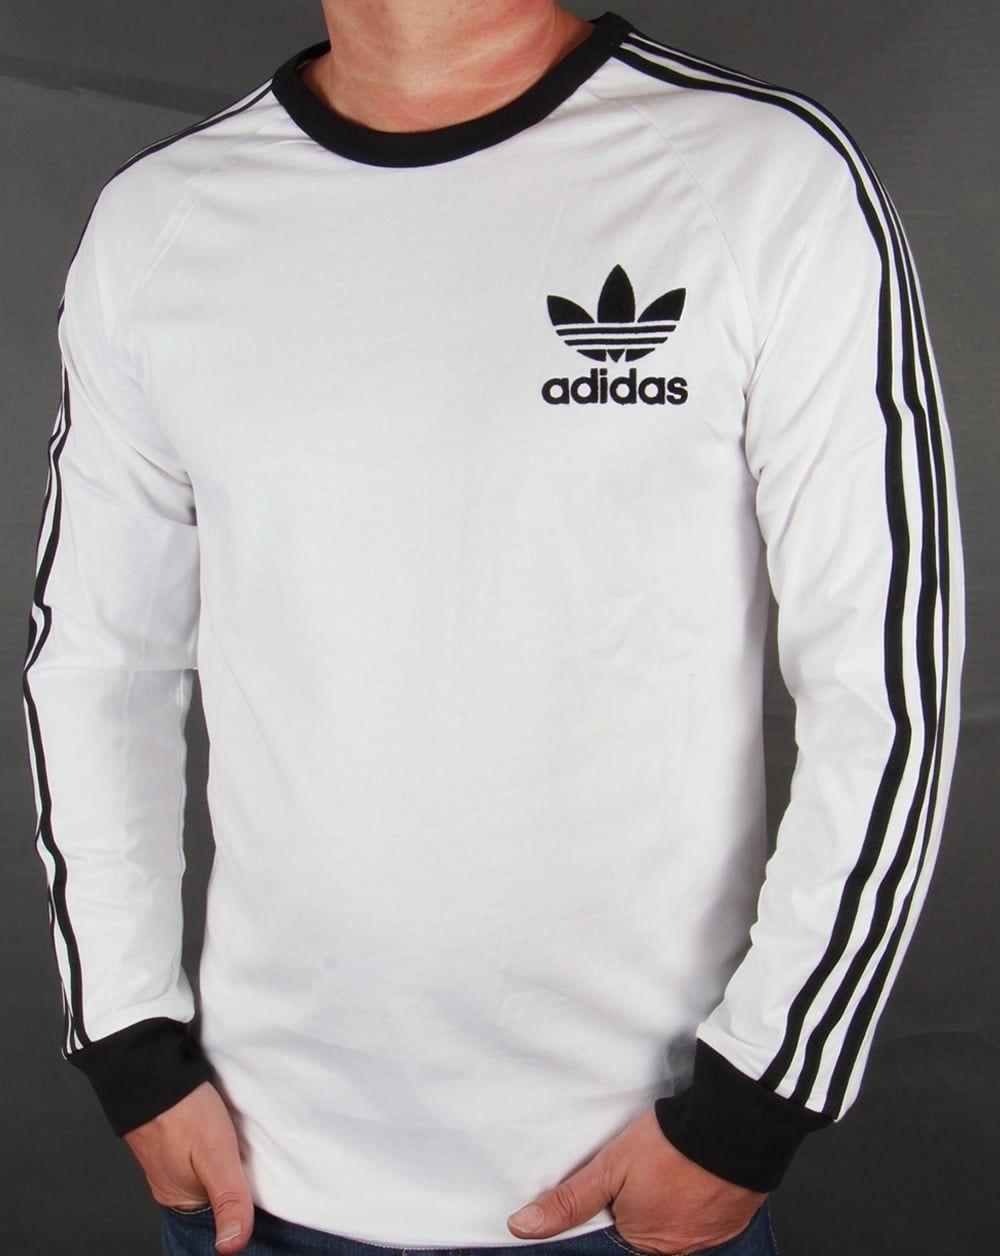 adidas long sleeve. adidas-originals-3-stripes-oversized-long-sleeve-t- adidas long sleeve